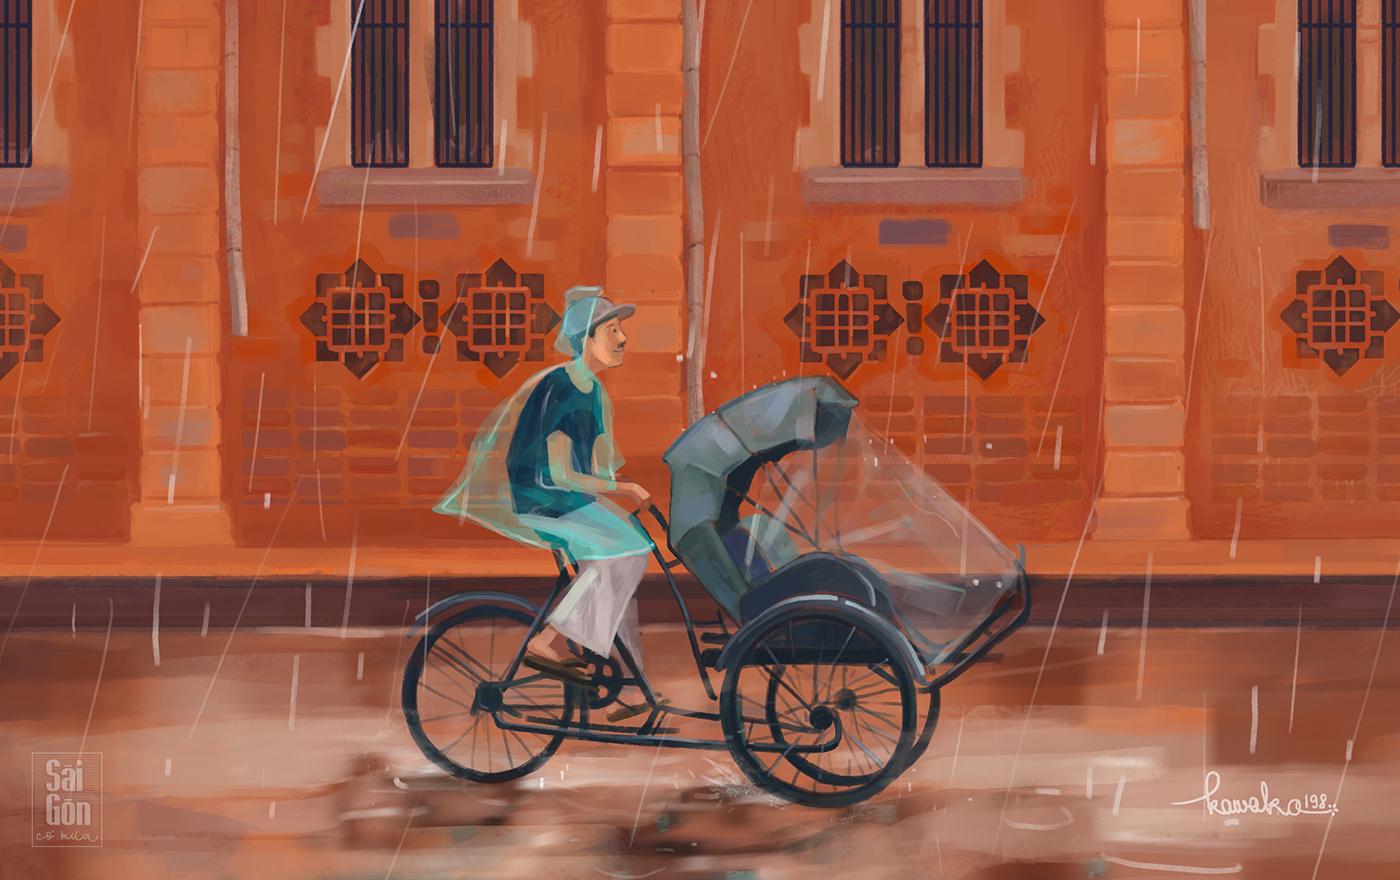 saigon rain vietnam ILLUSTRATION art creative